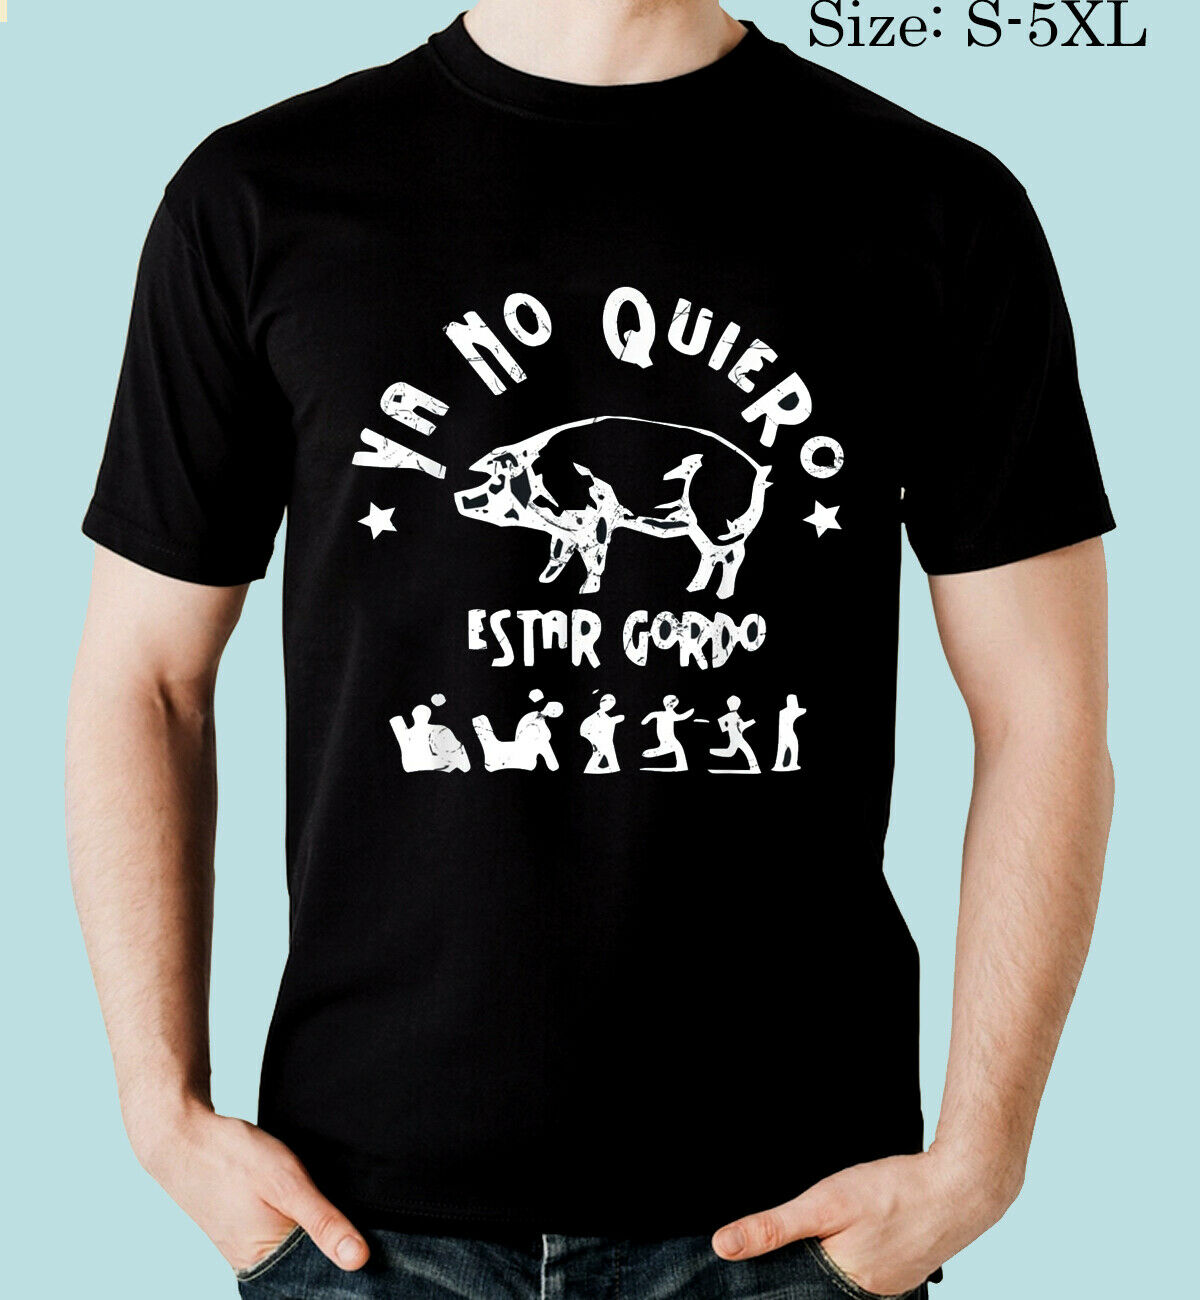 Ya No Quiero Estar Gordo T-Shirt